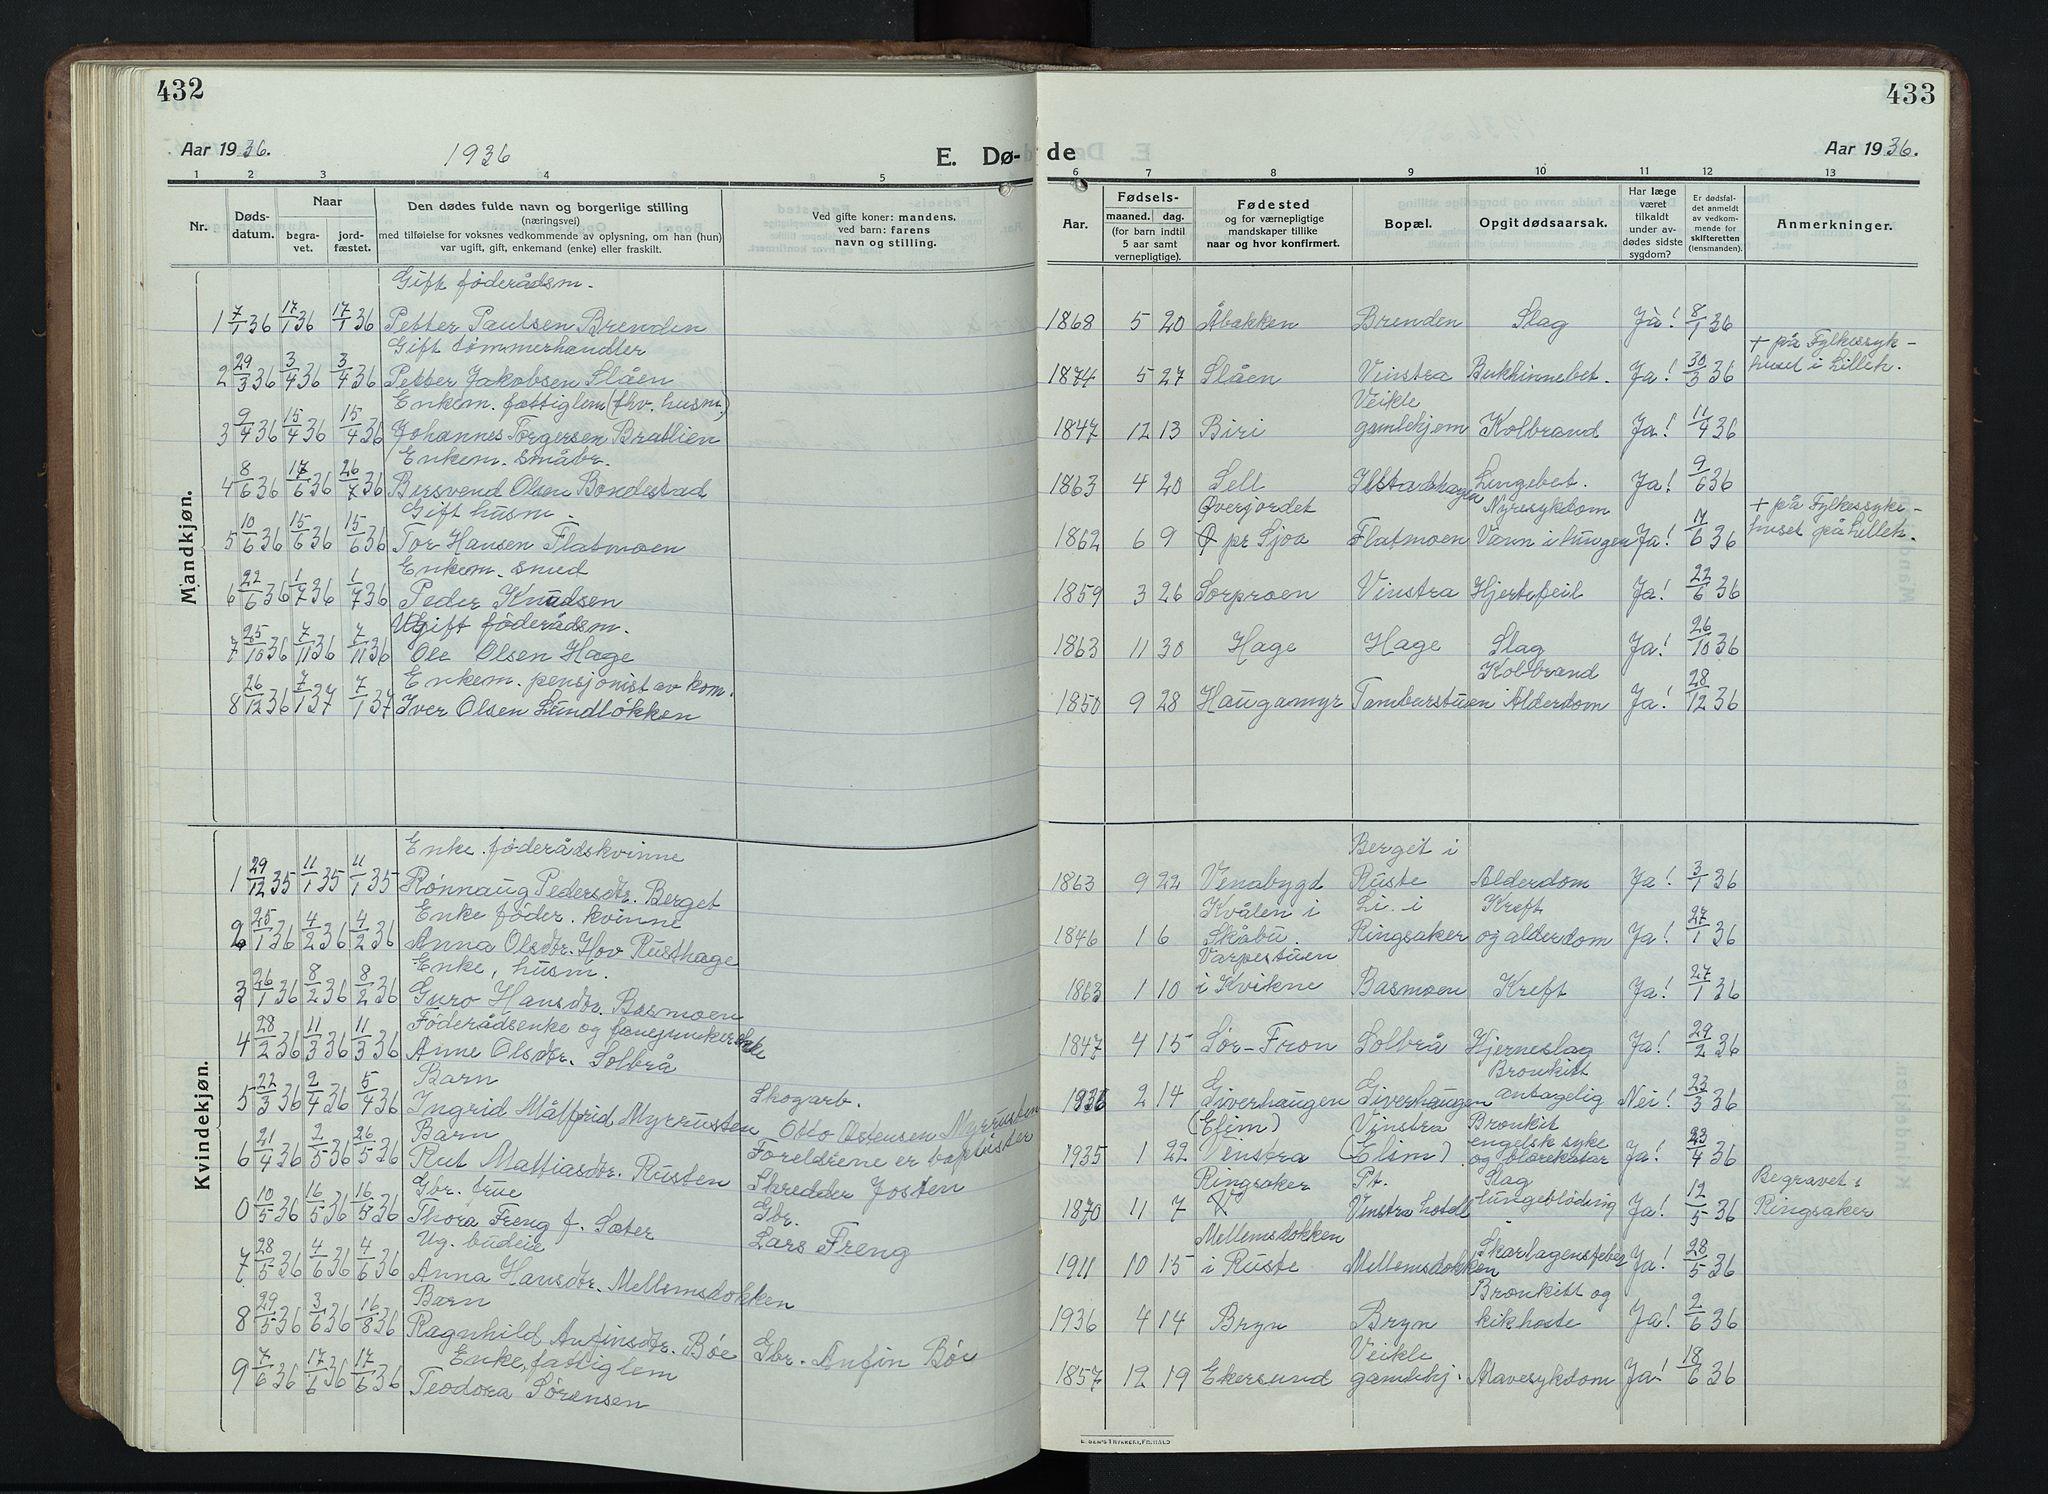 SAH, Nord-Fron prestekontor, Klokkerbok nr. 7, 1915-1946, s. 432-433